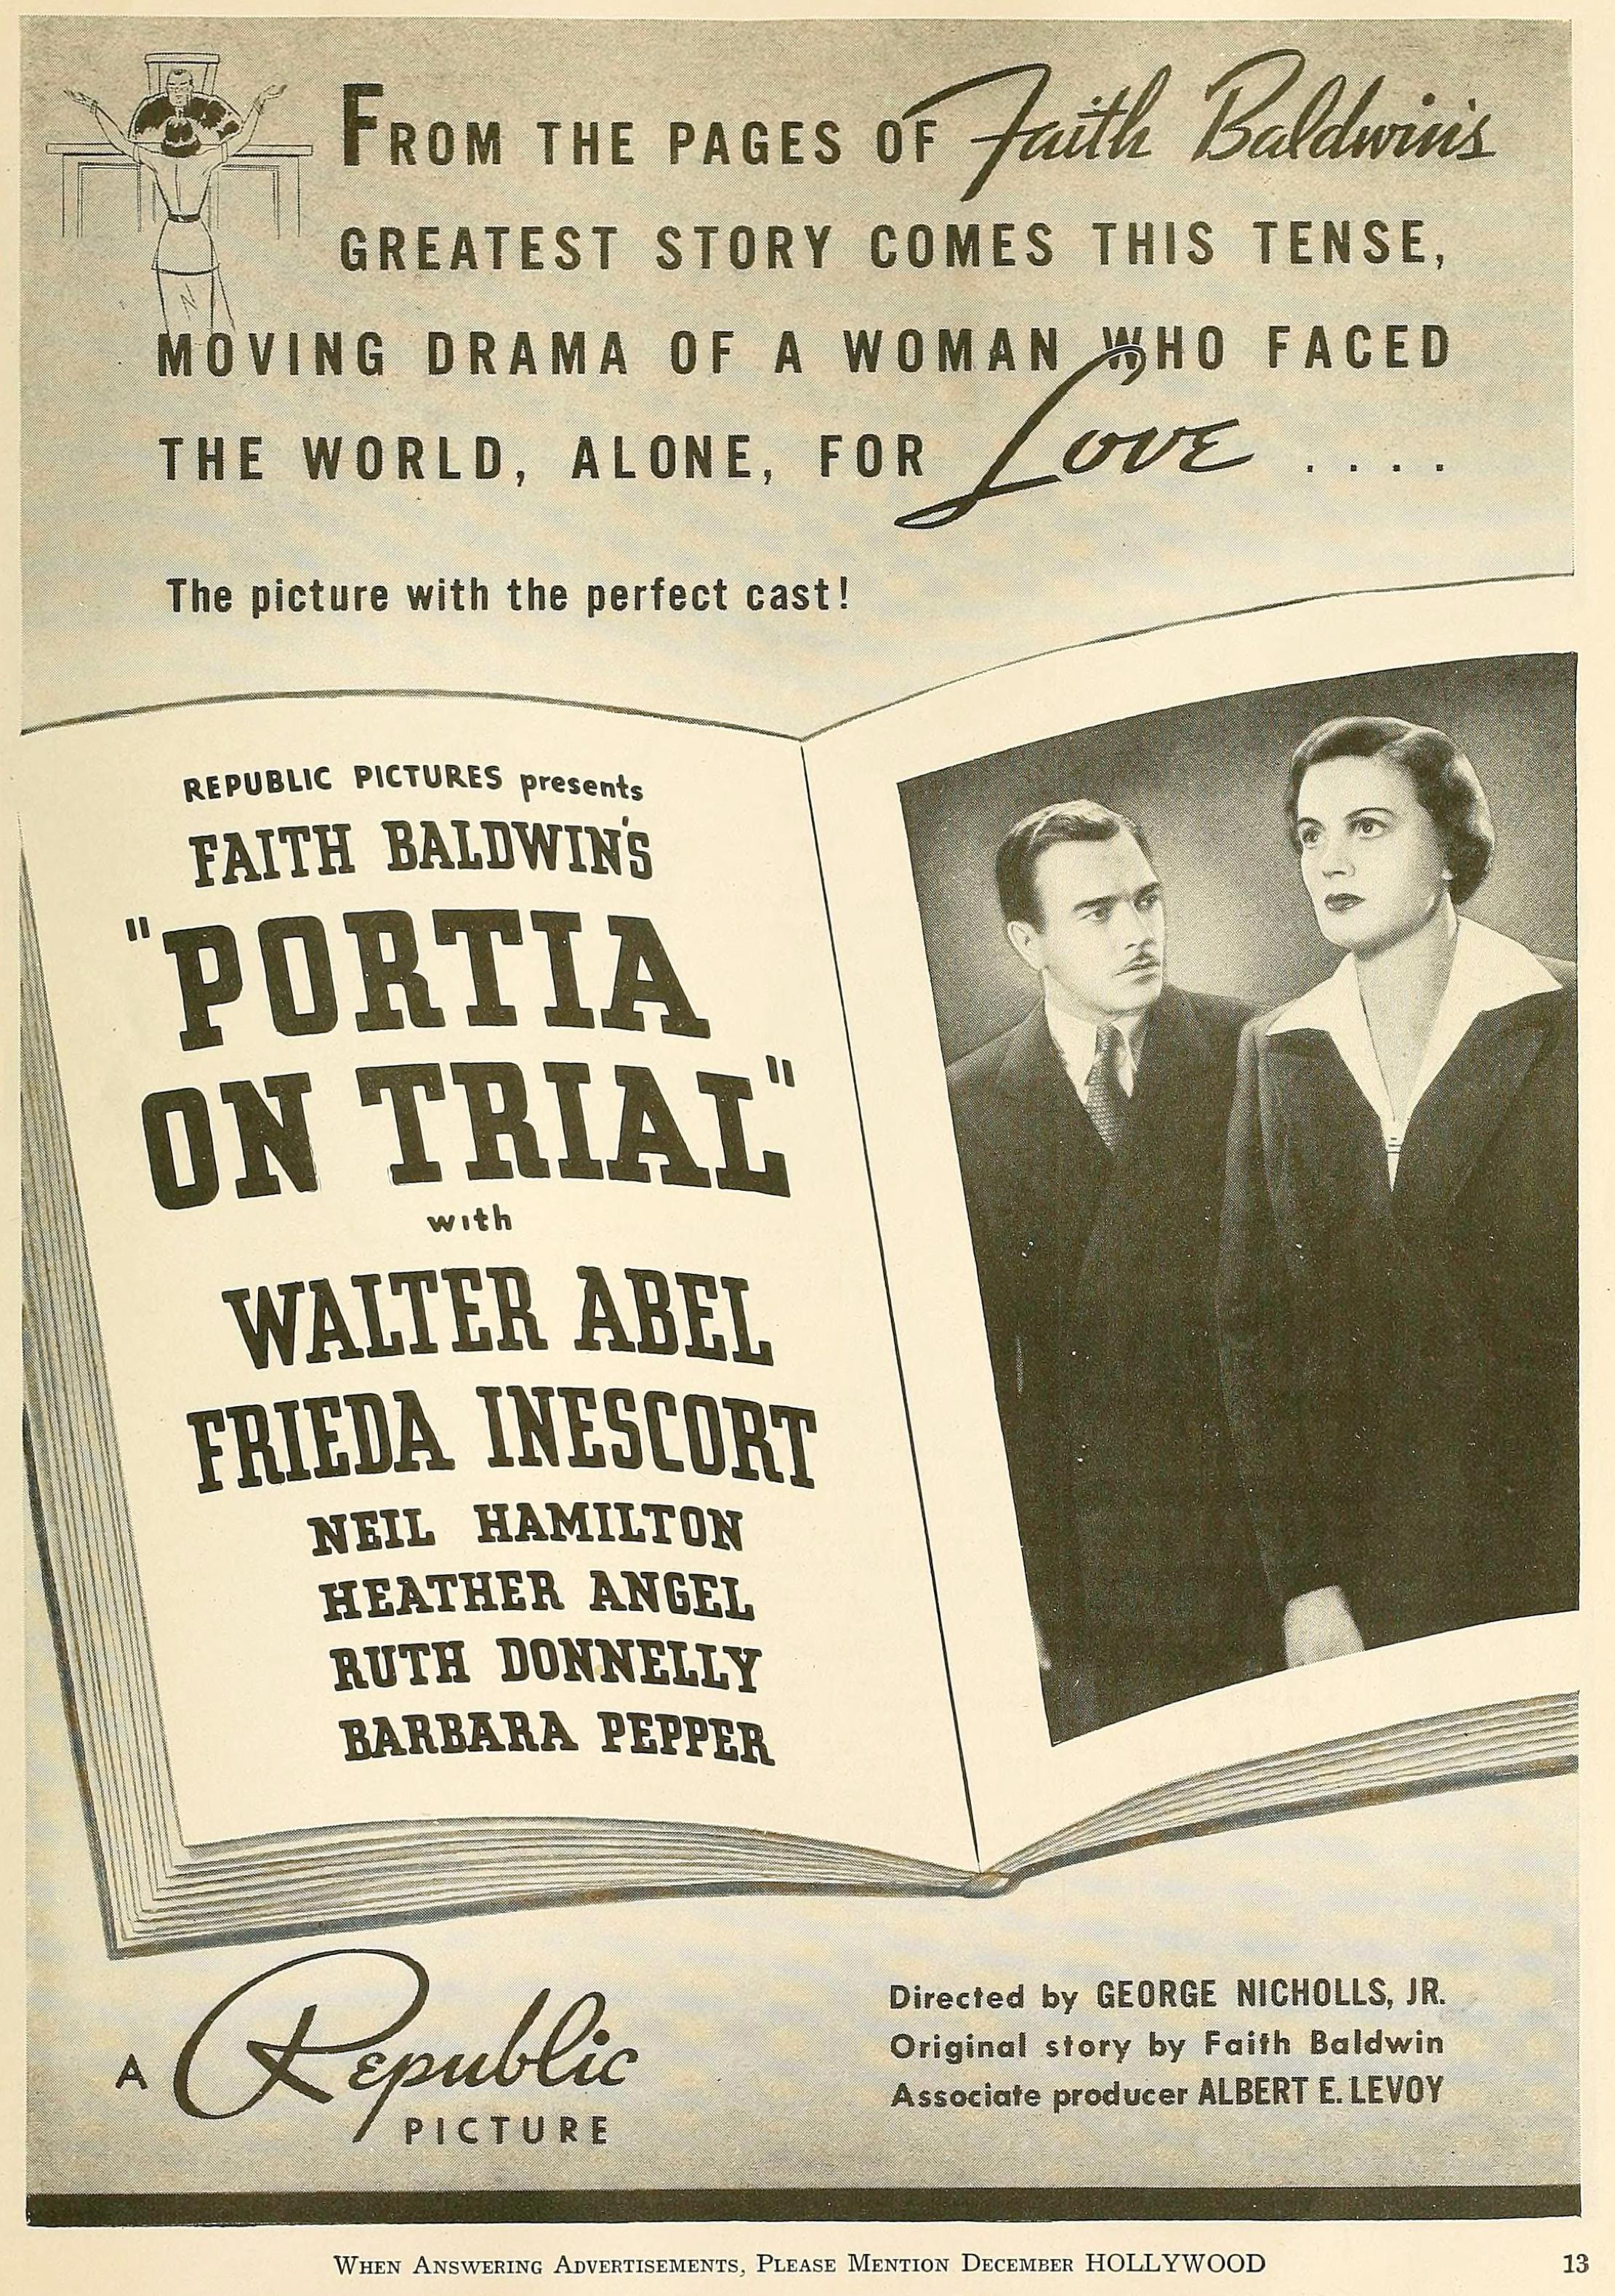 hollywood december 1937la